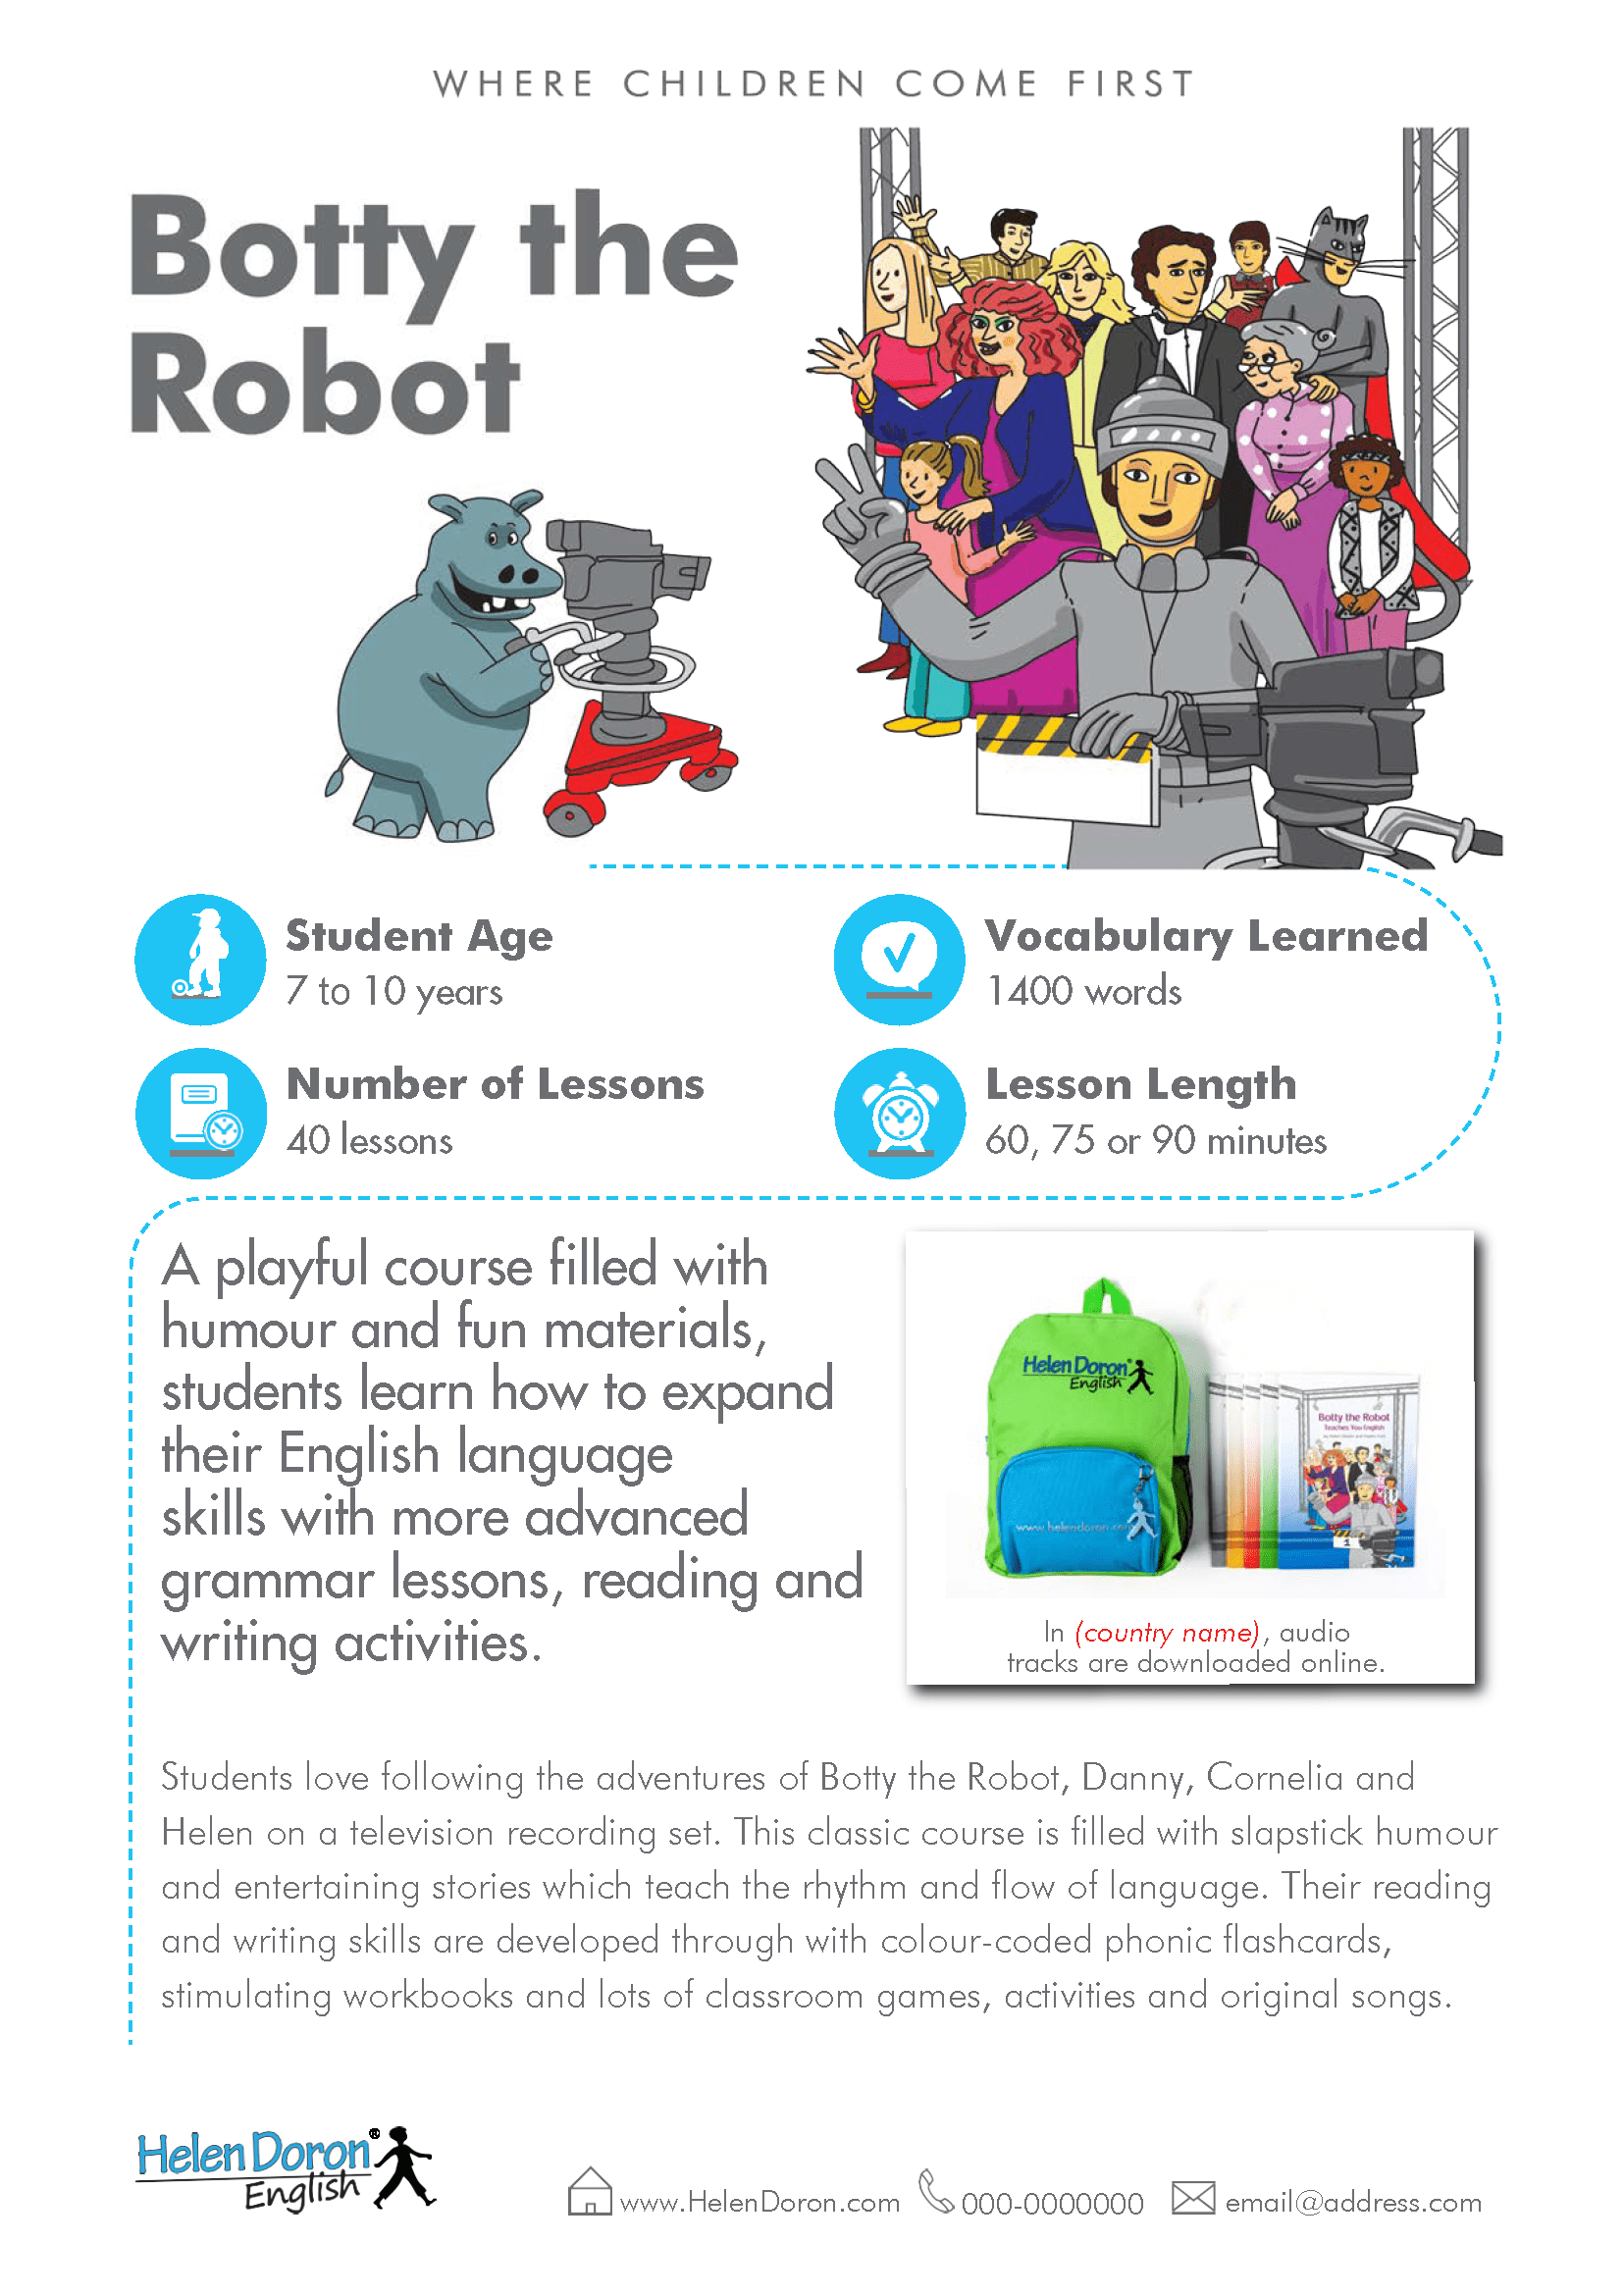 Parsisiųsti - Botty the Robot 